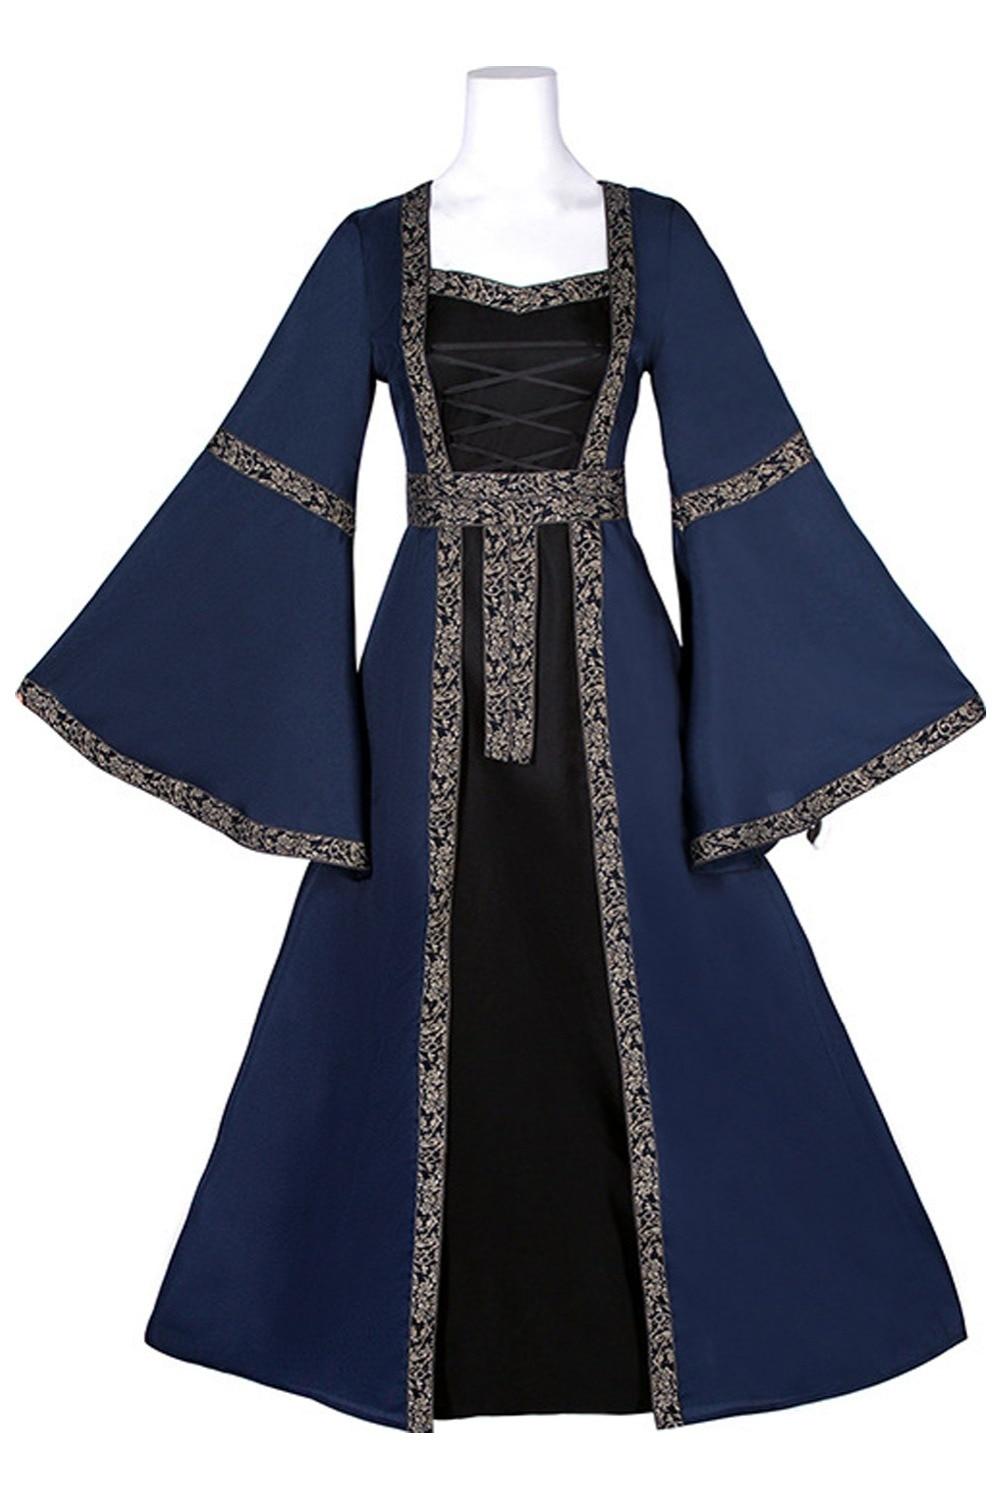 Medieval Costume Women Victoria Vintage Dress High Waist Trumpet Sleeve Gothic Dress Ball Gown Long Sleeve